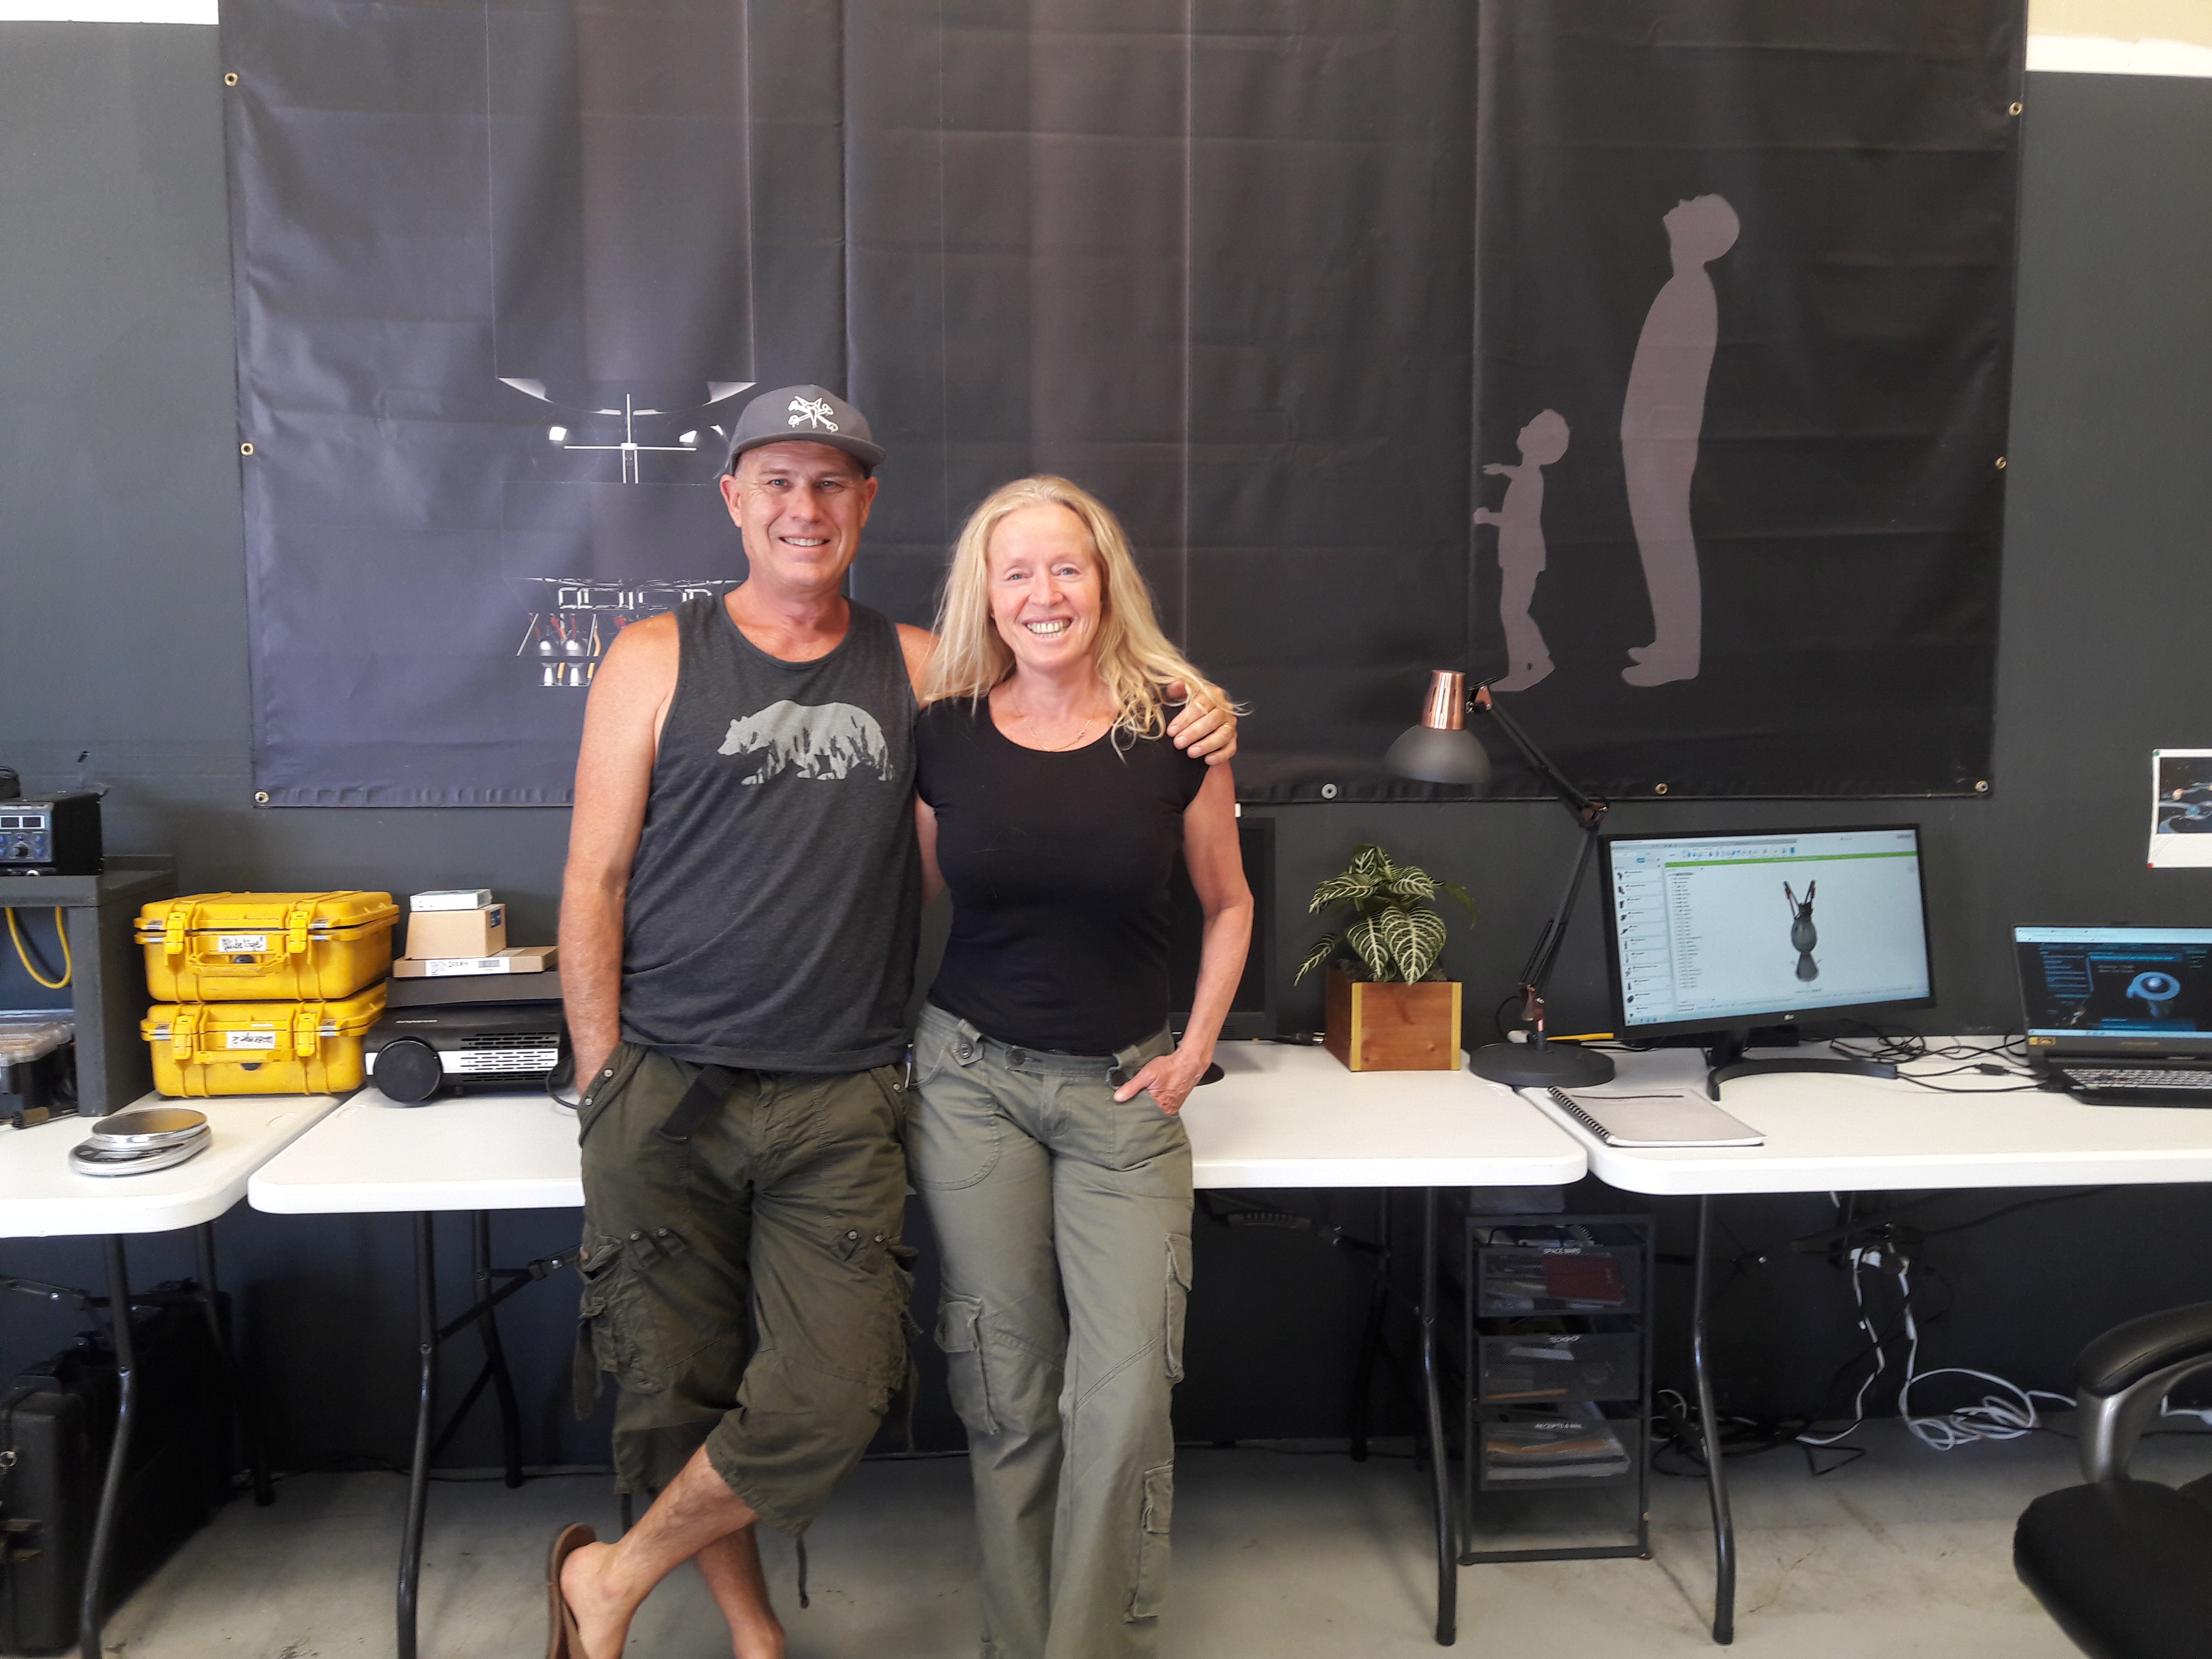 Tom and Tina Sjogren, co-founders of PythomSpace. Image via PythomSpace.